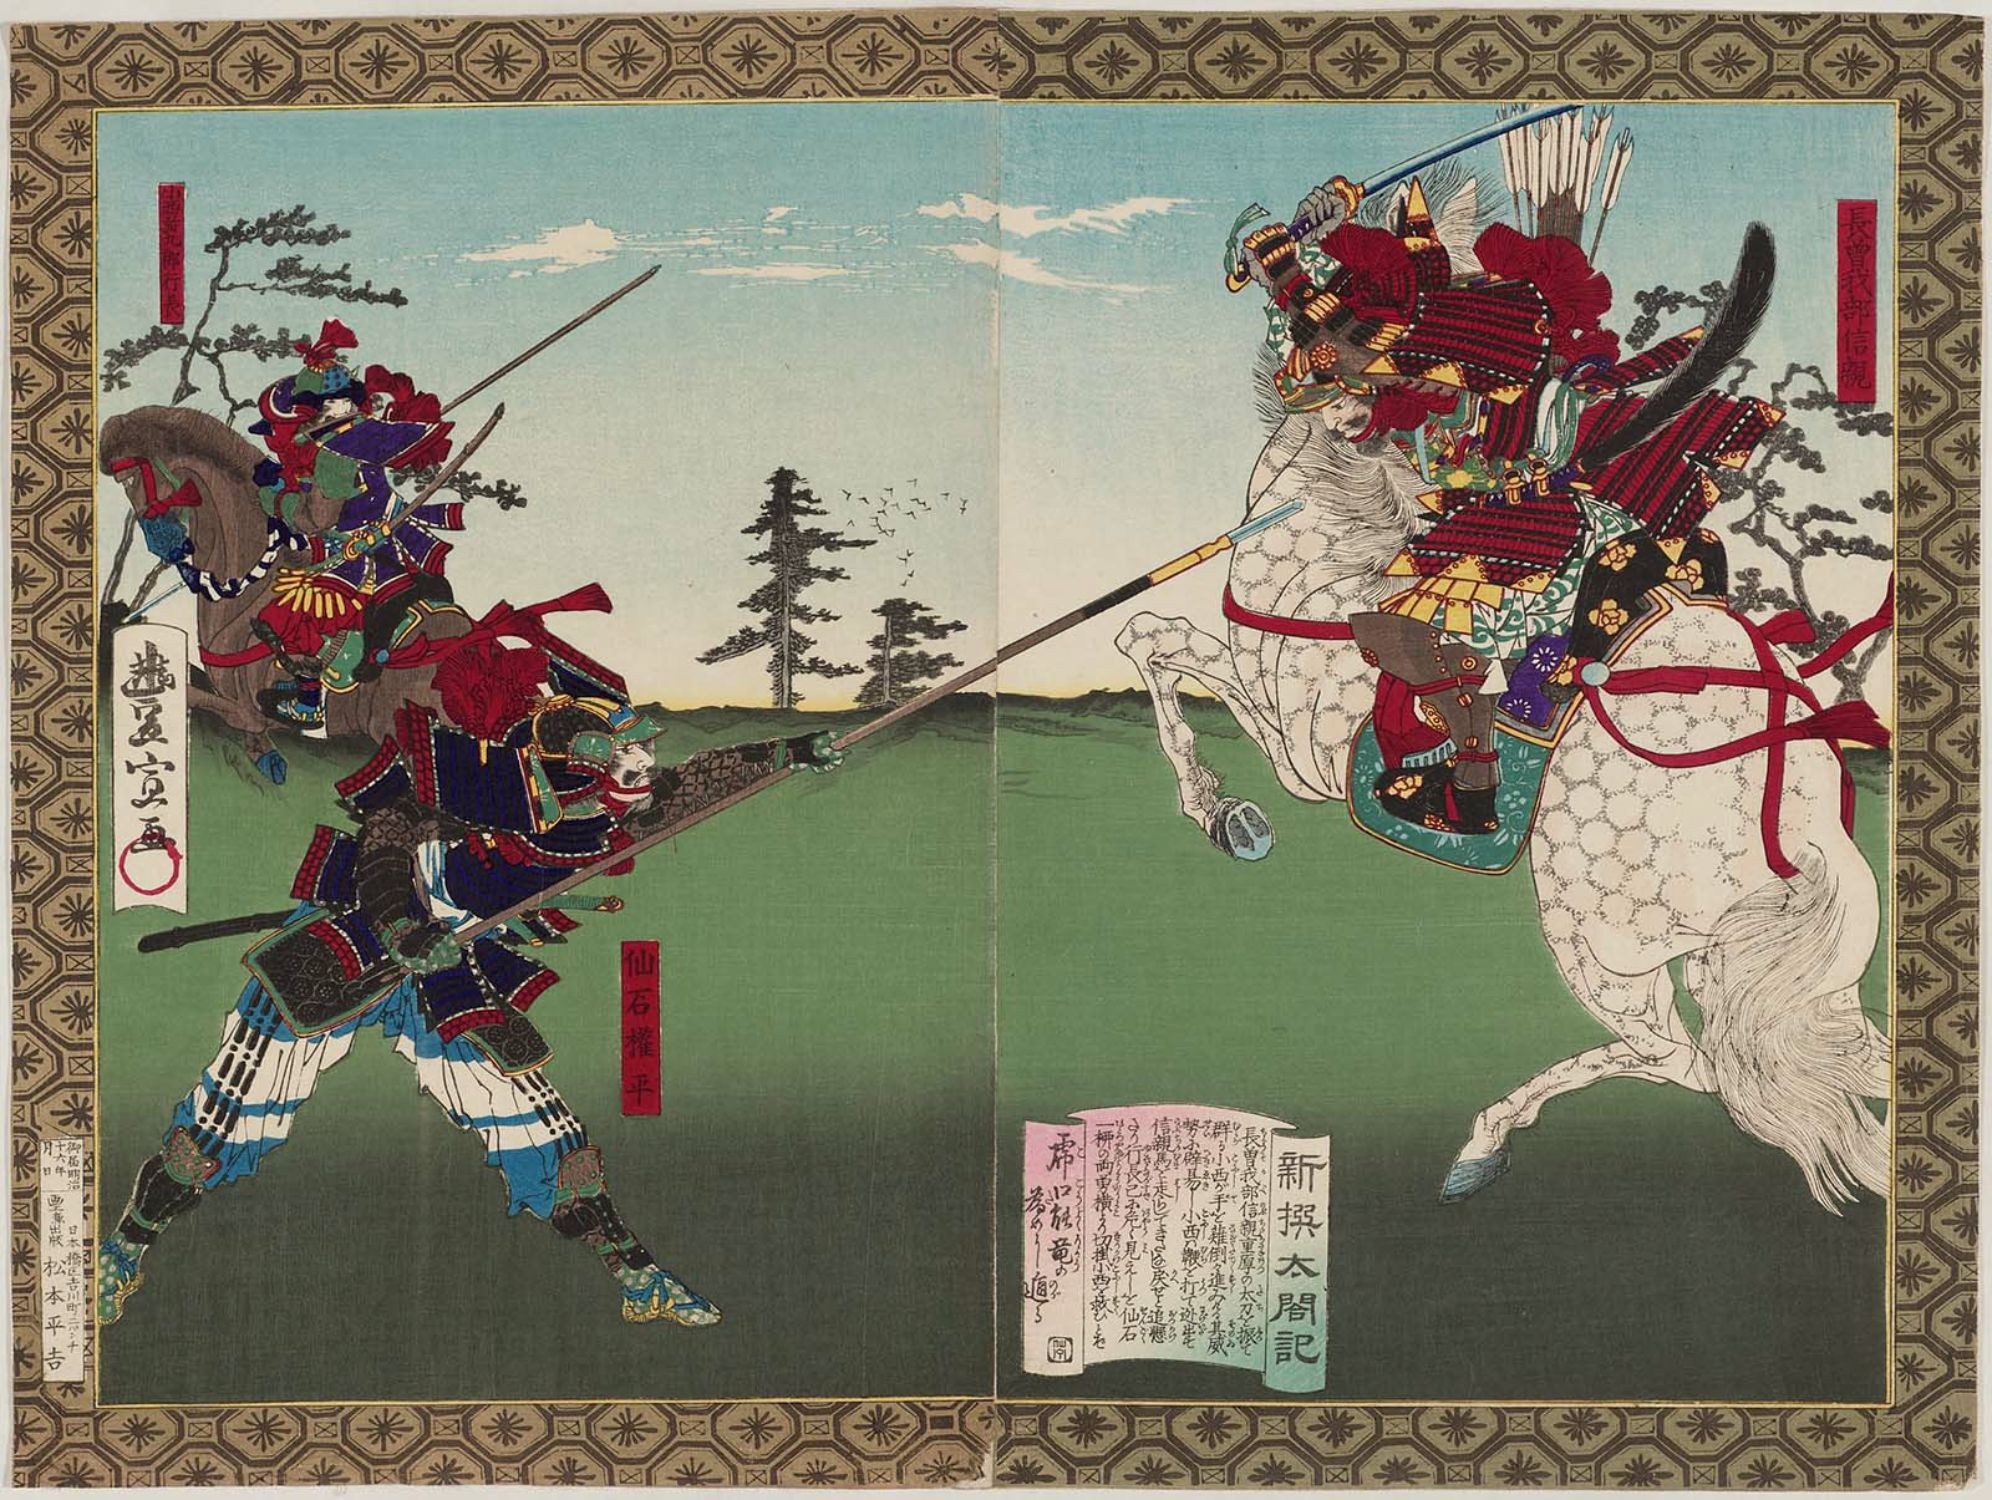 Utagawa Toyonobu: Chosakabé Nobuchika and Sengoku Gonbei